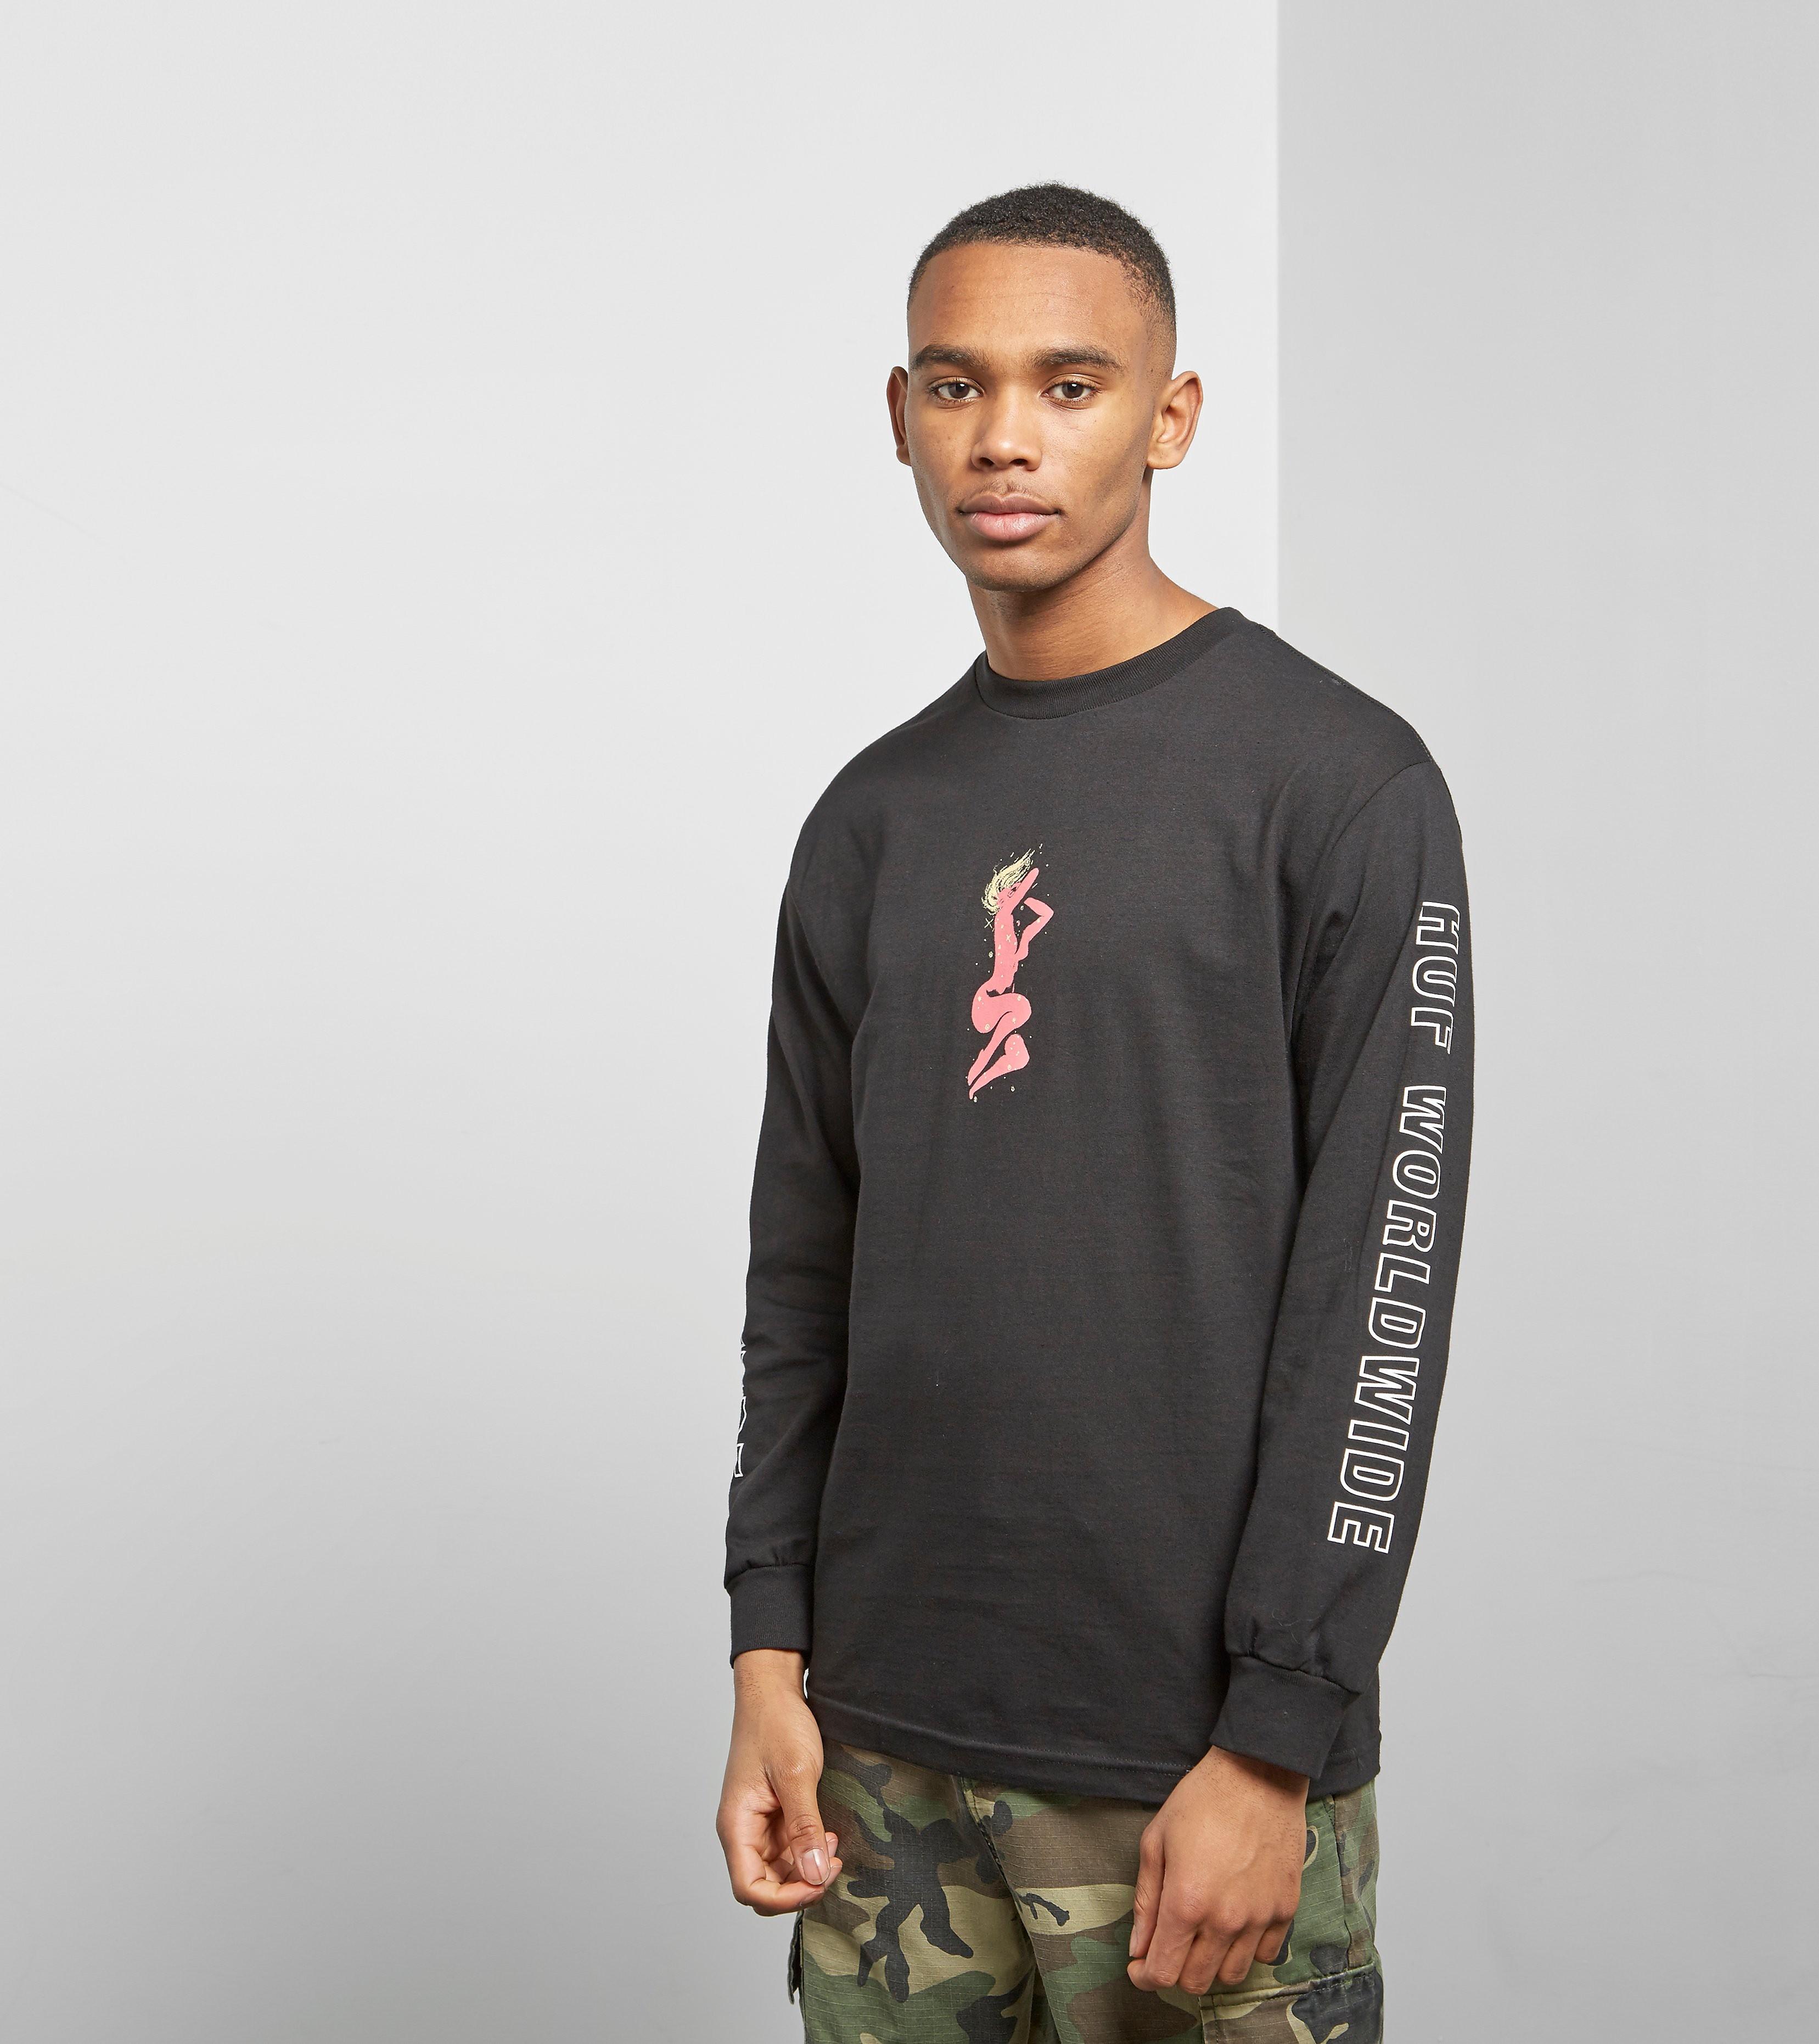 HUF Nebula Long Sleeved T-shirt